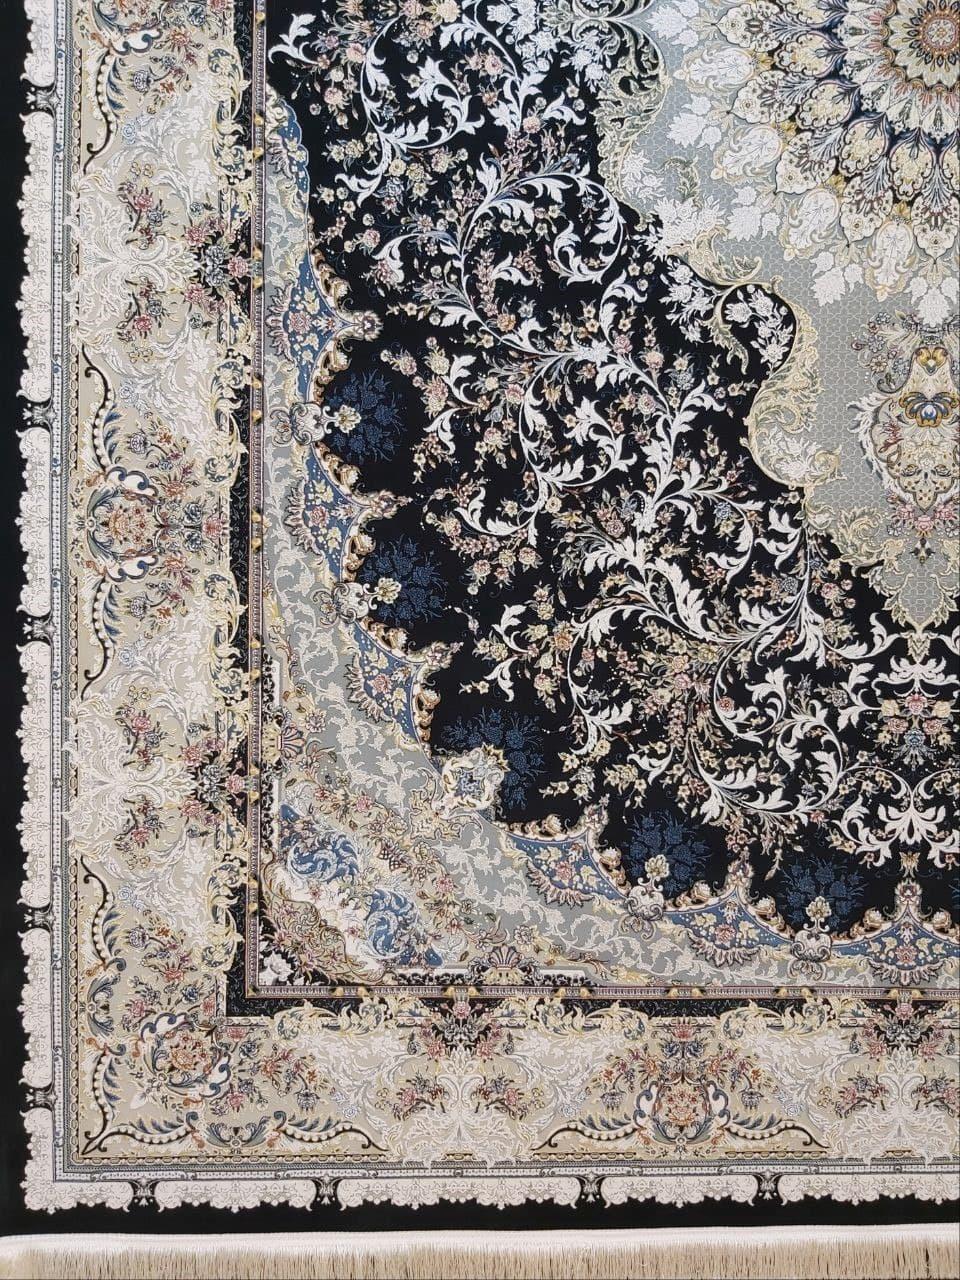 فرش 1500 شانه گل برجسته نقشه تبسم زمینه ذغالی